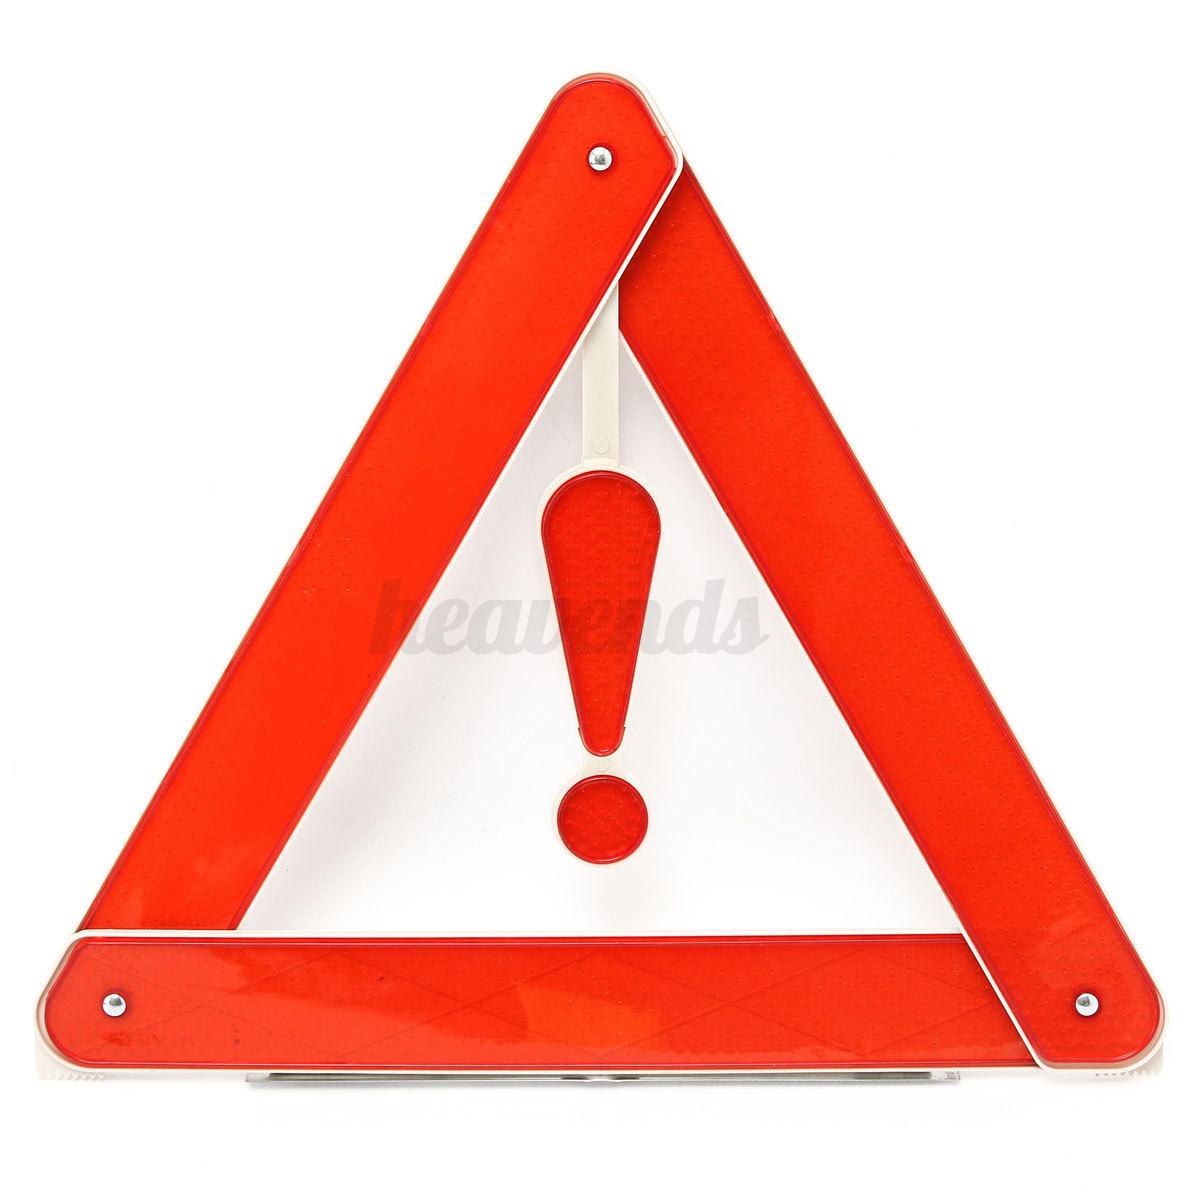 avertissement s curit triangle urgence rouge r flective. Black Bedroom Furniture Sets. Home Design Ideas